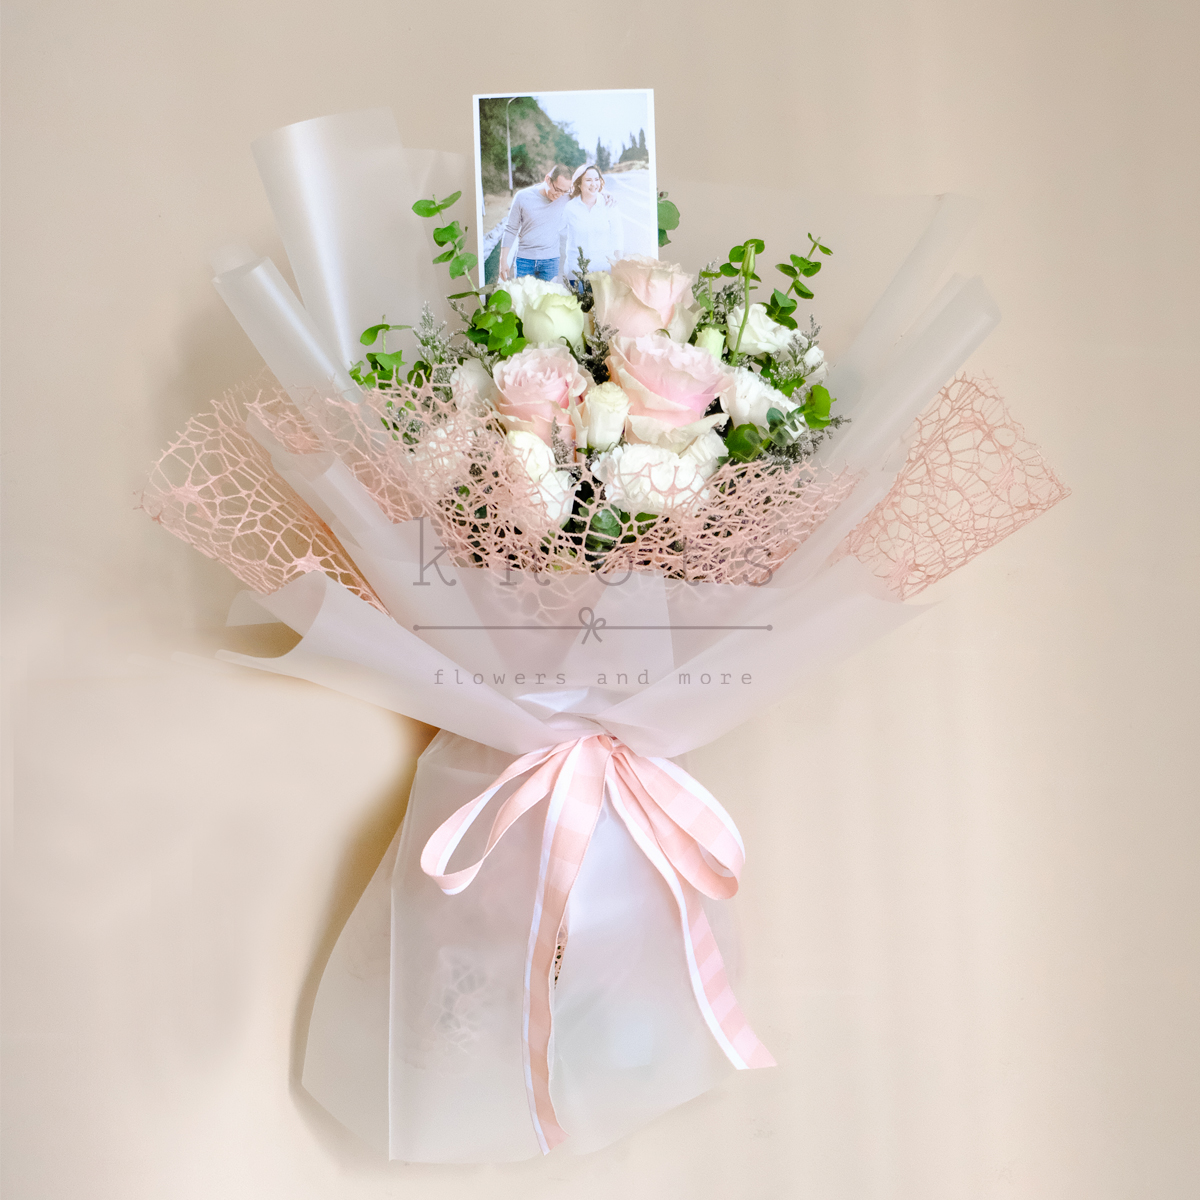 Memory Lane (Light Pink Ecuadorian Roses Bouquet With 4R Photo)